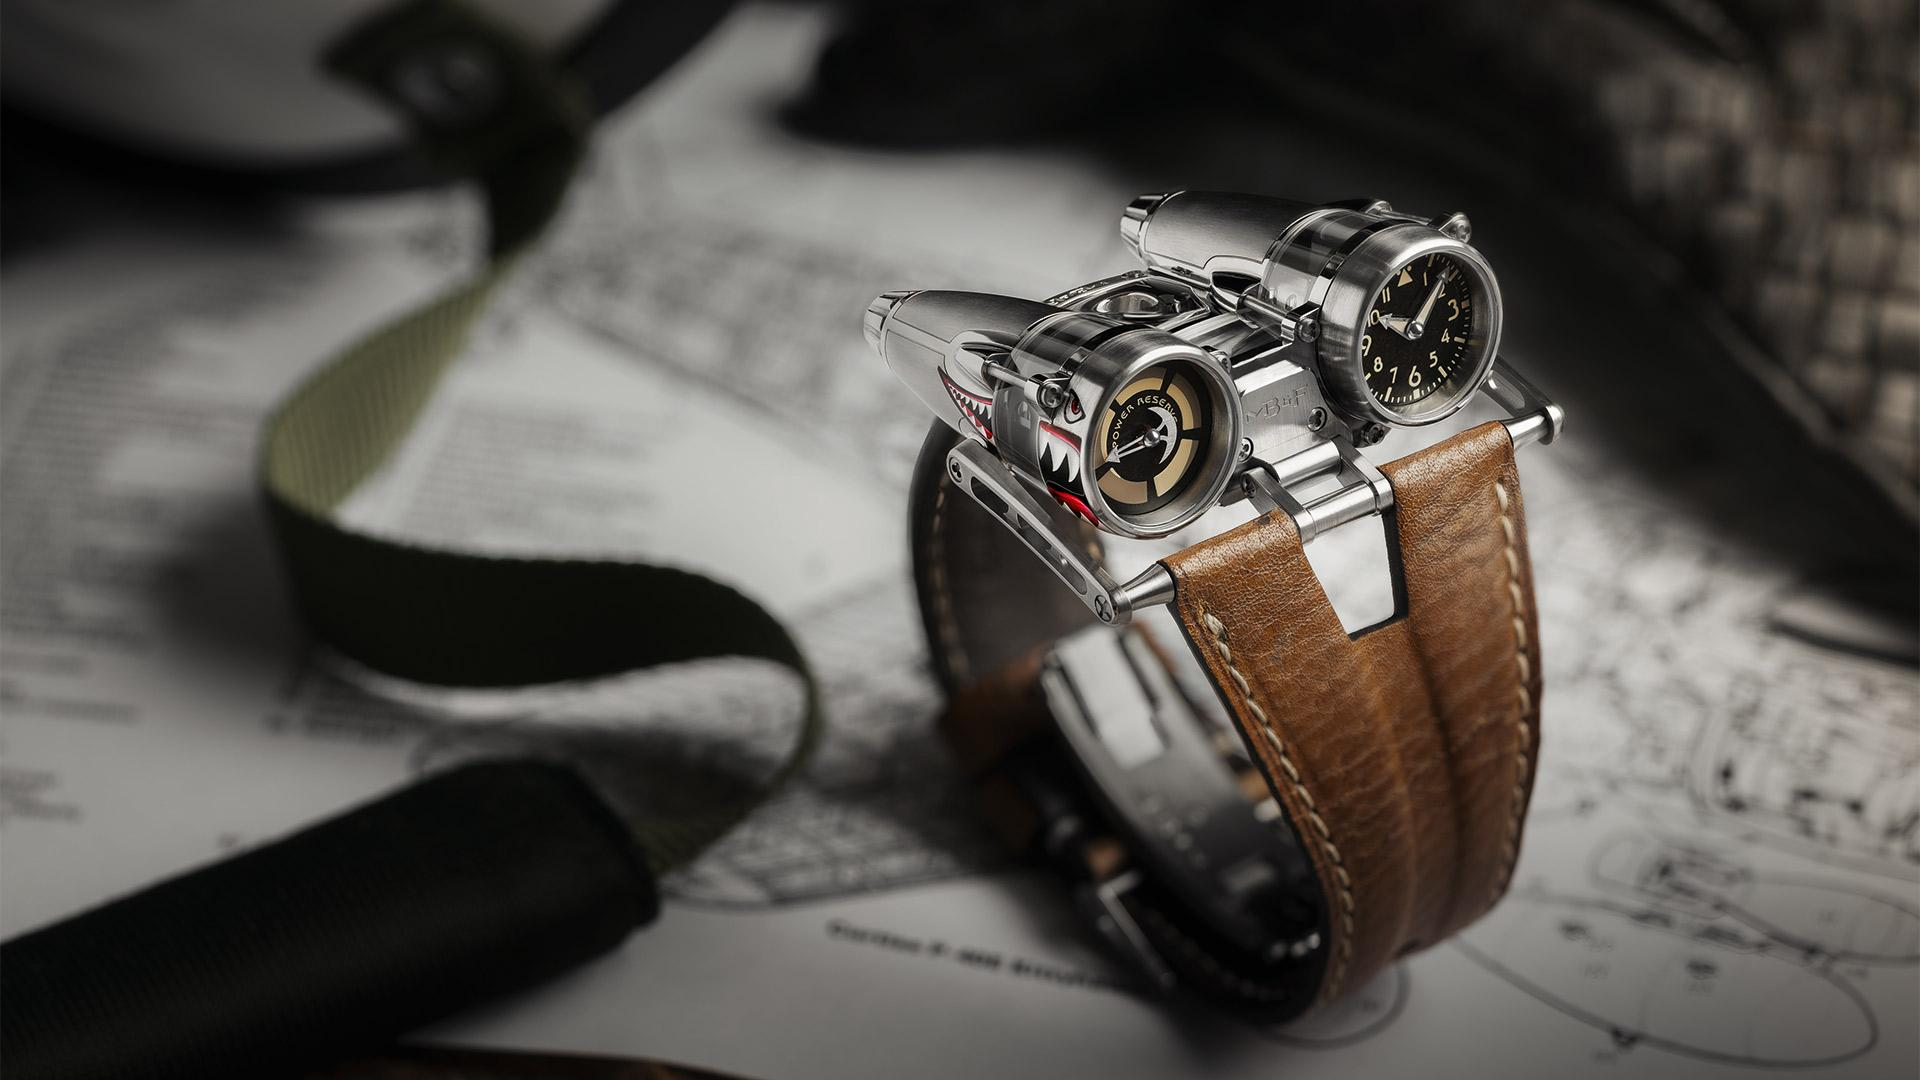 MB&F HM04 'Thunderbolt' watch